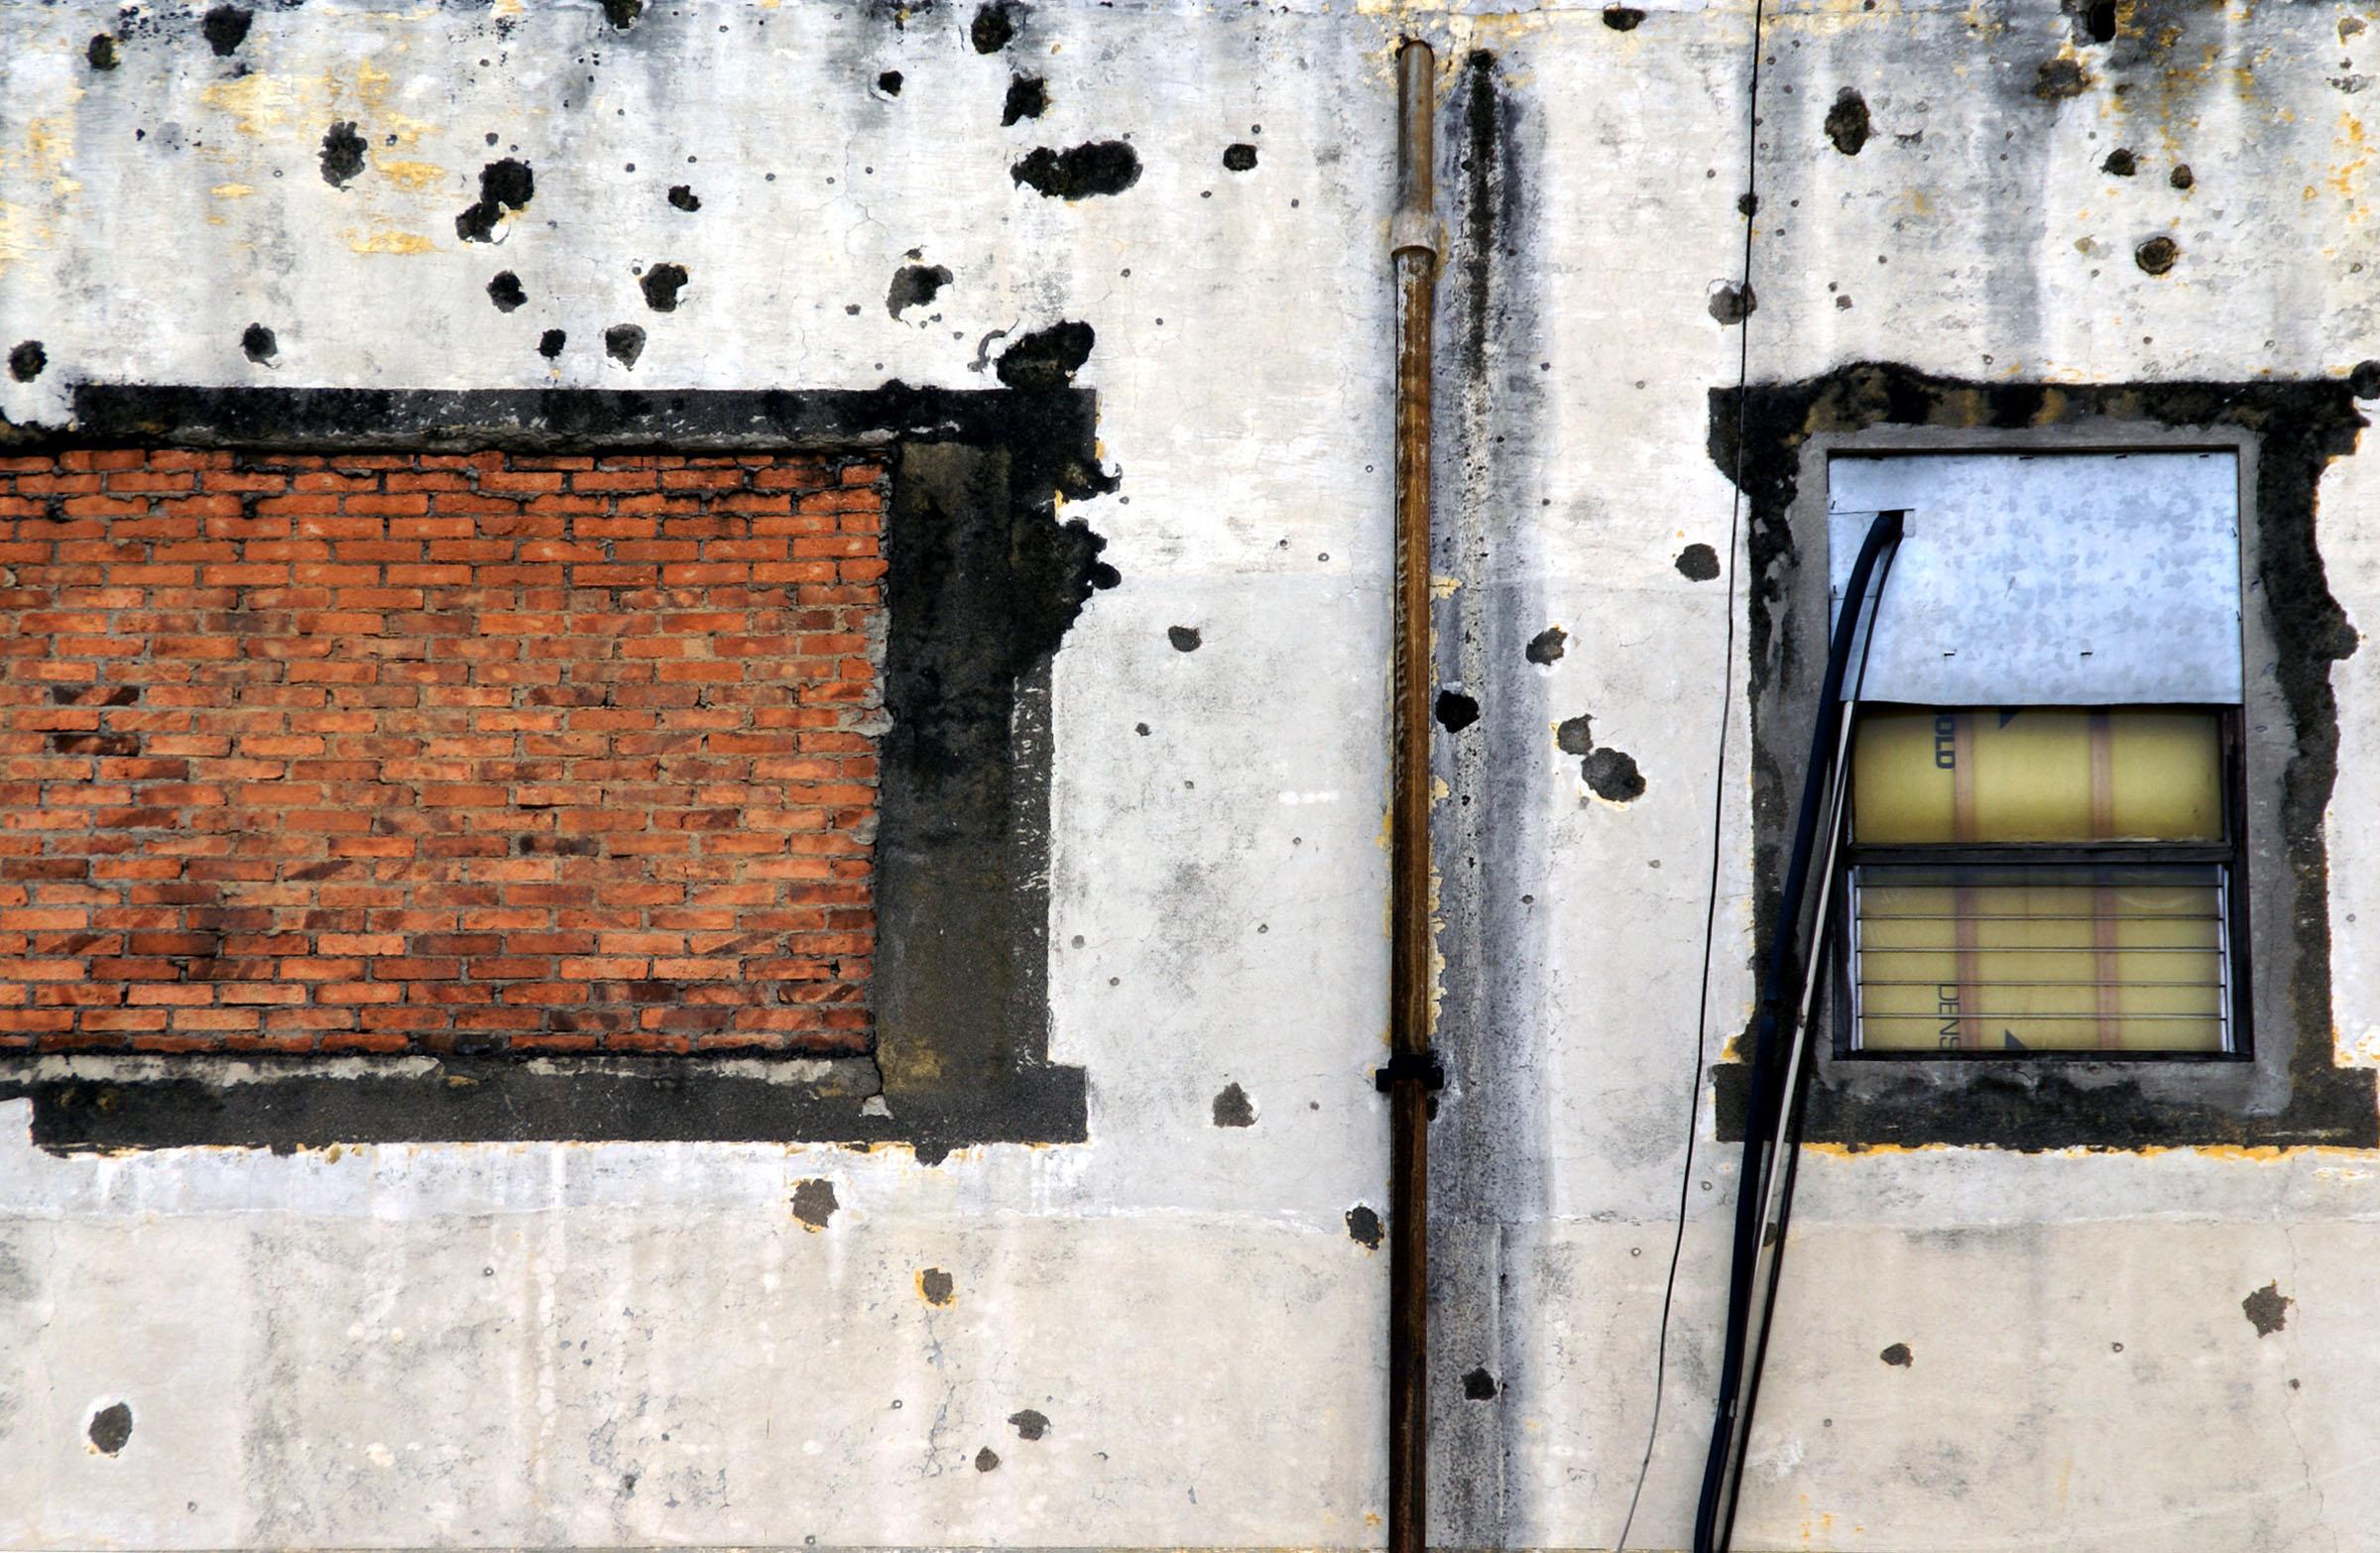 7 San Jose pockmarked wall w windows.jpg